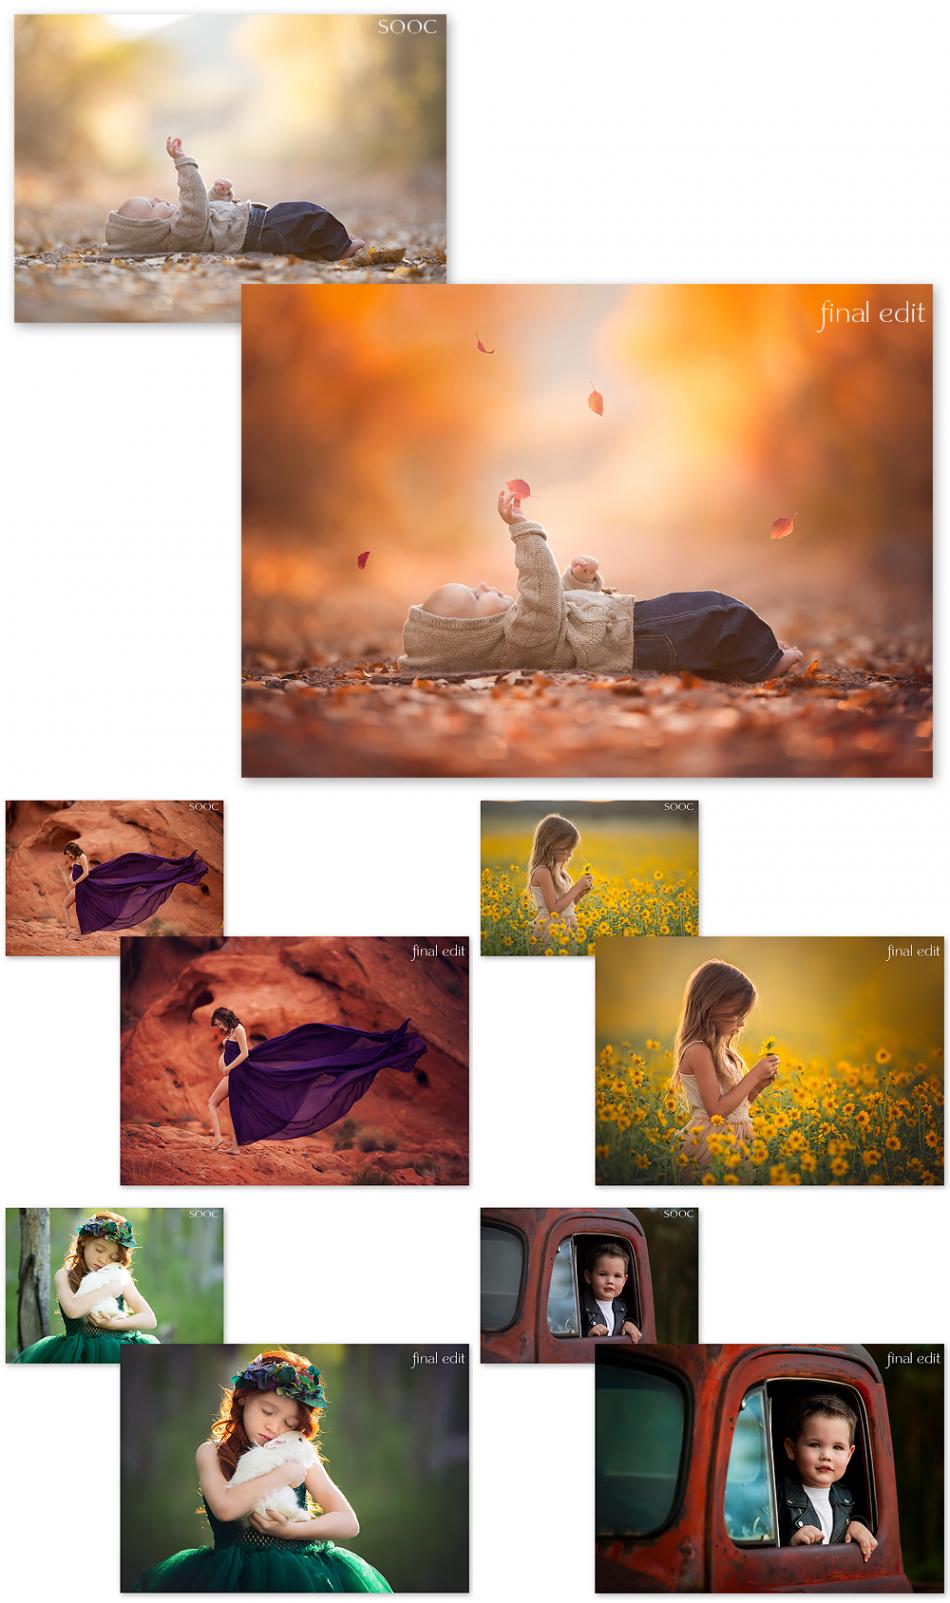 LJHolloway-Photography-Las-Vegas-Photographer-August-2014-Editing-Video-Collage-01